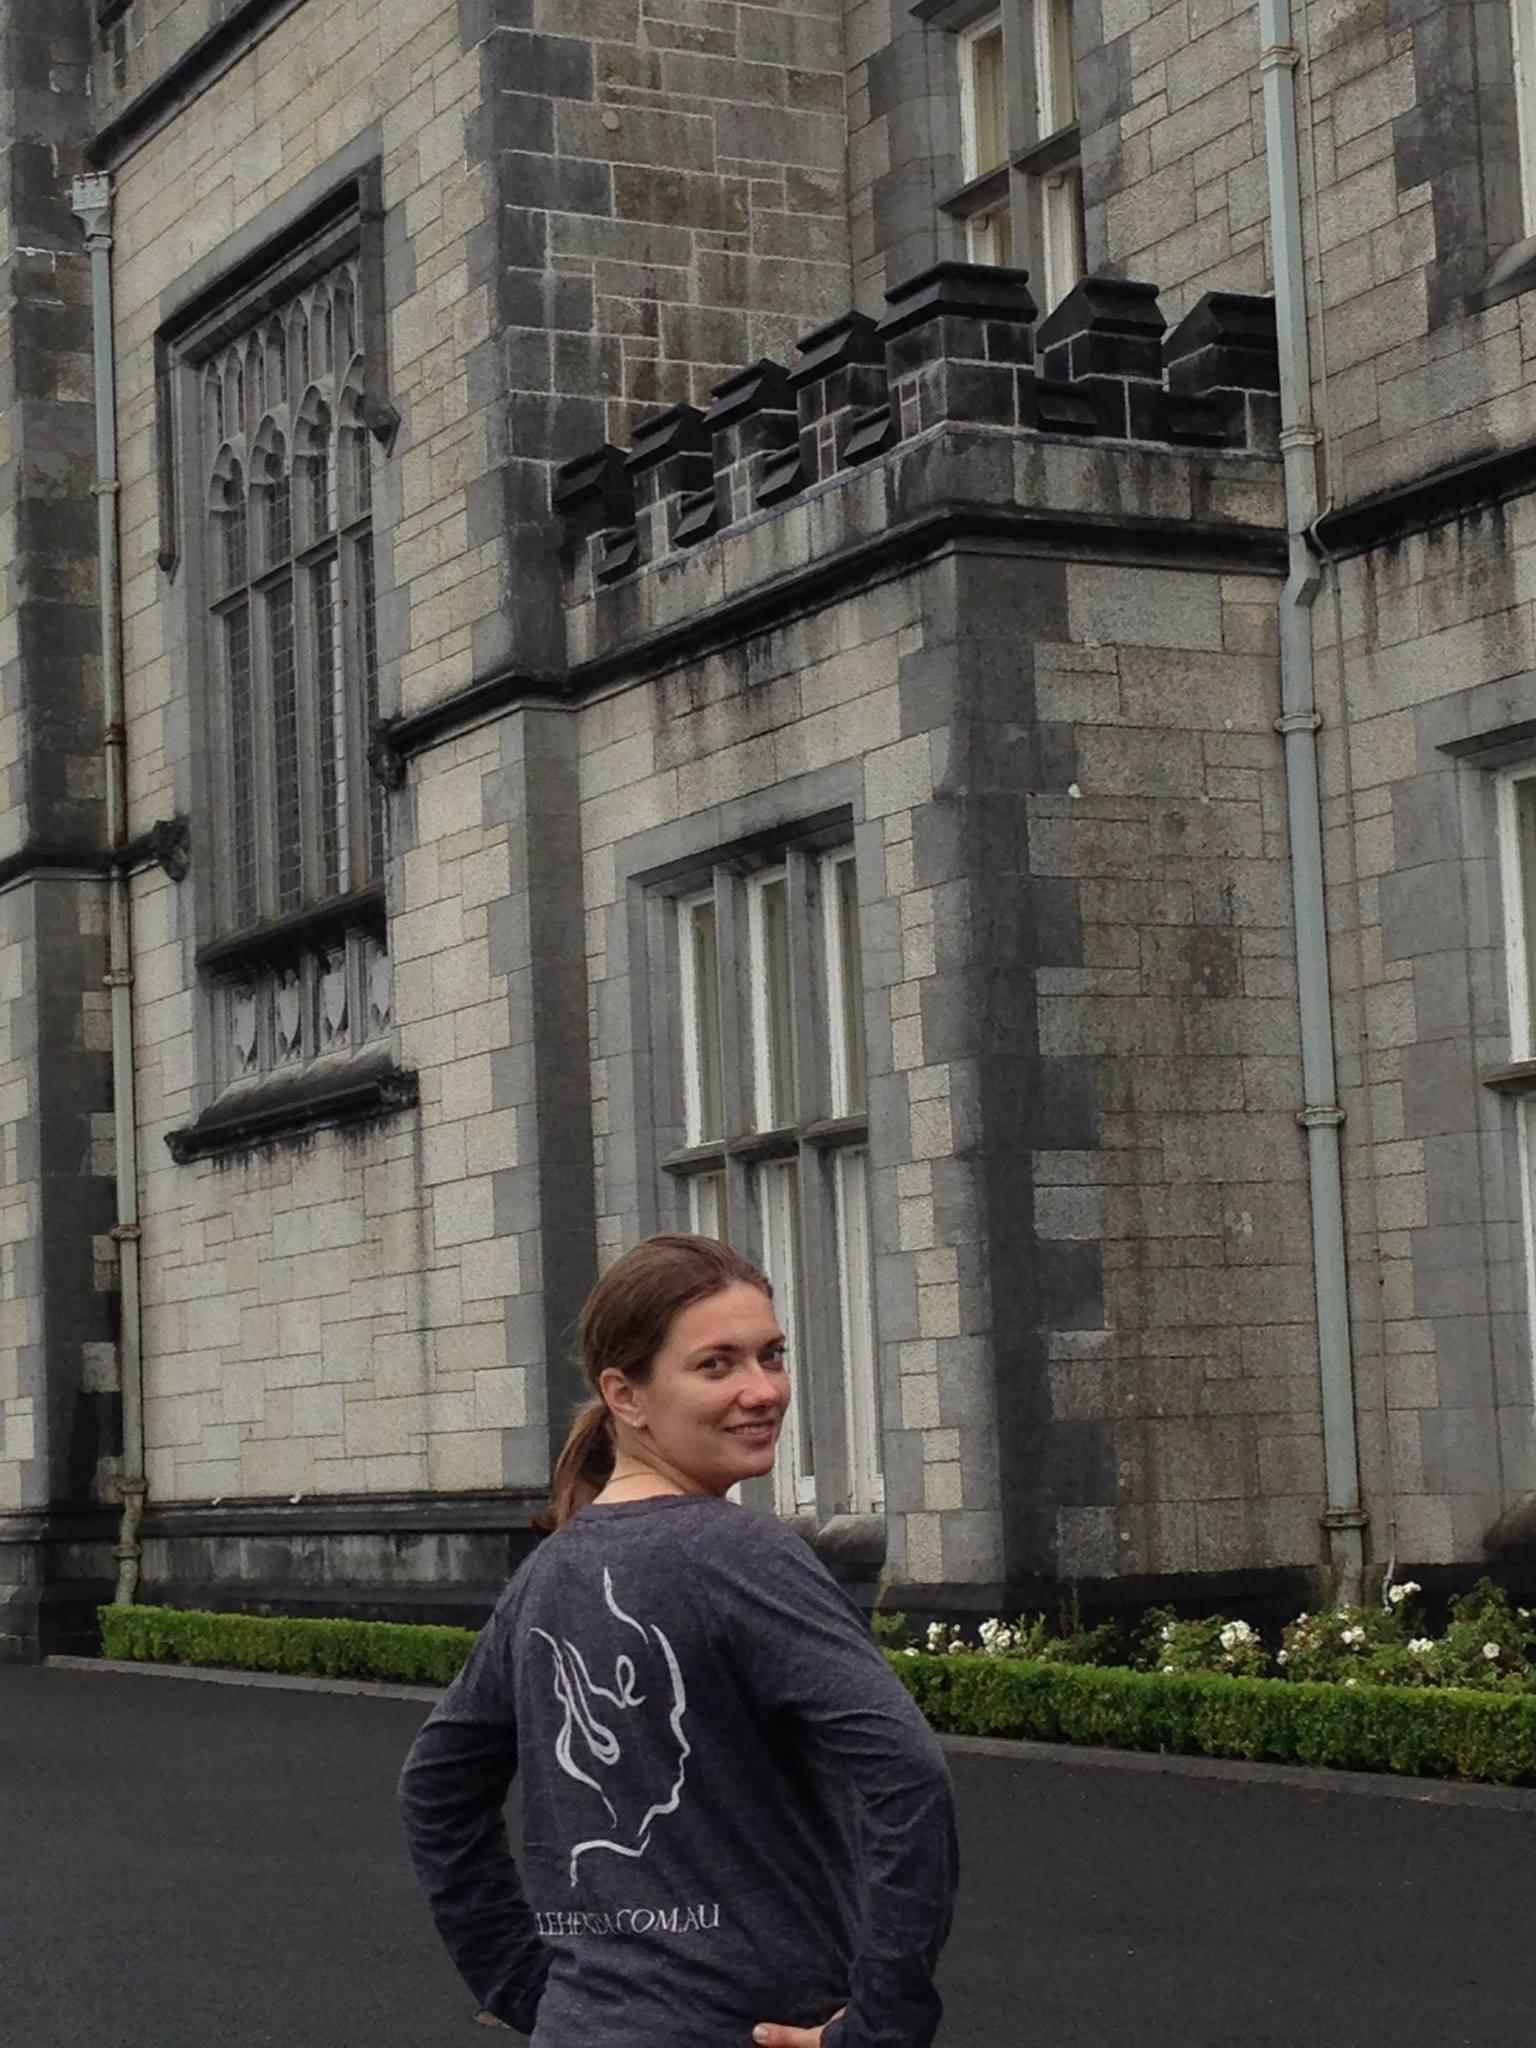 Anna at the Kylemore, Connemara, Co. Galway, Ireland!